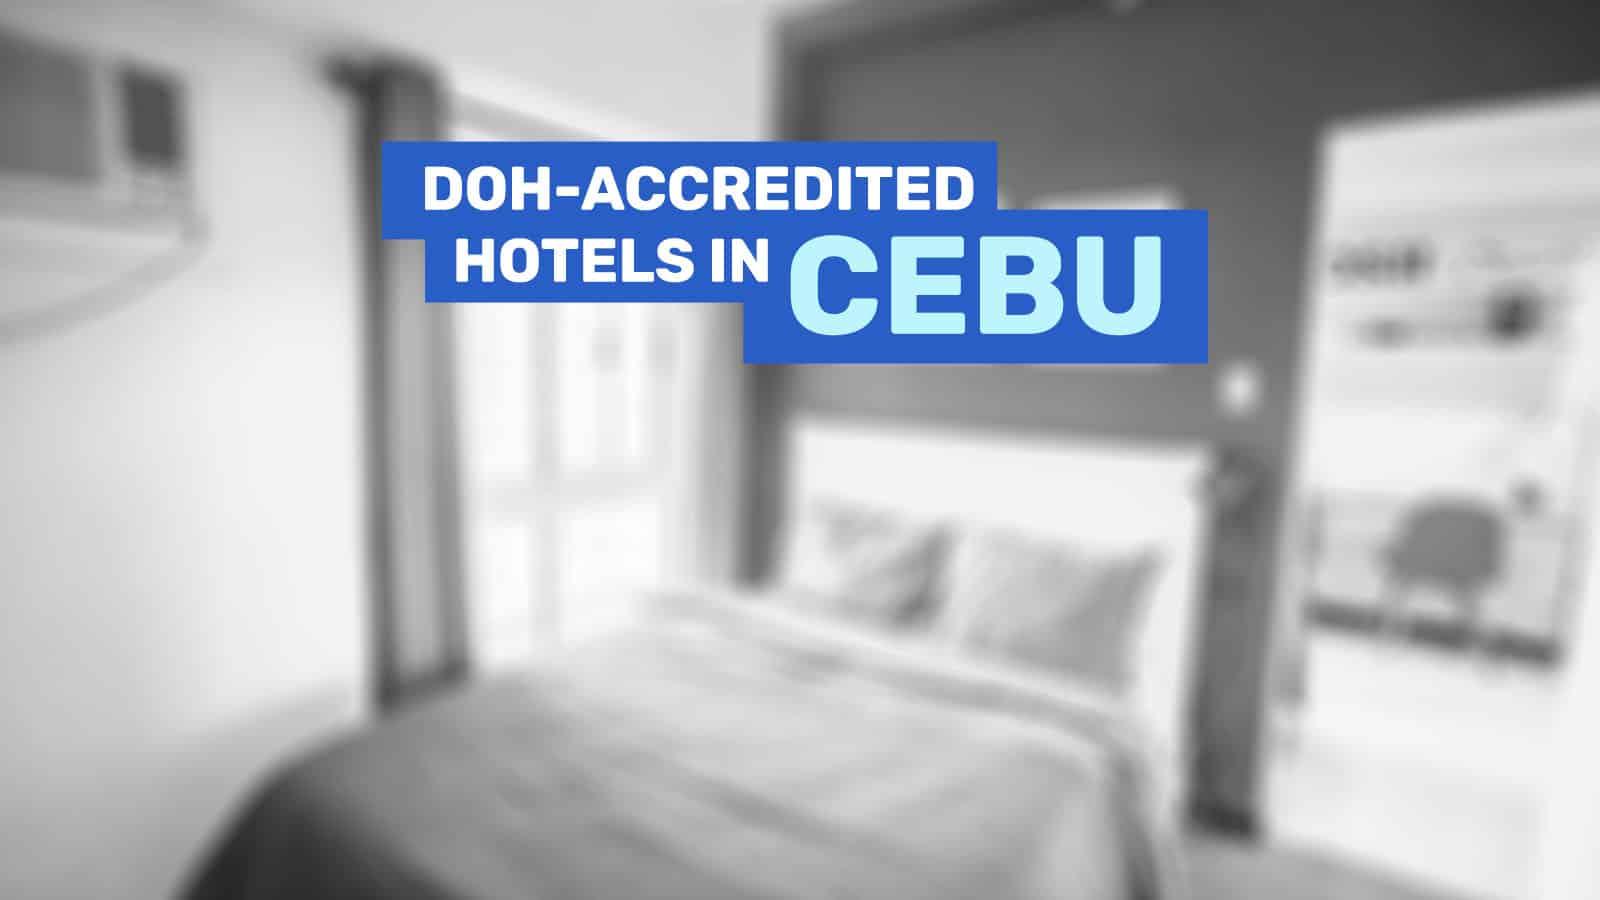 List of DOH-Accredited Hotels in CEBU for Quarantine (Returning Filipinos)